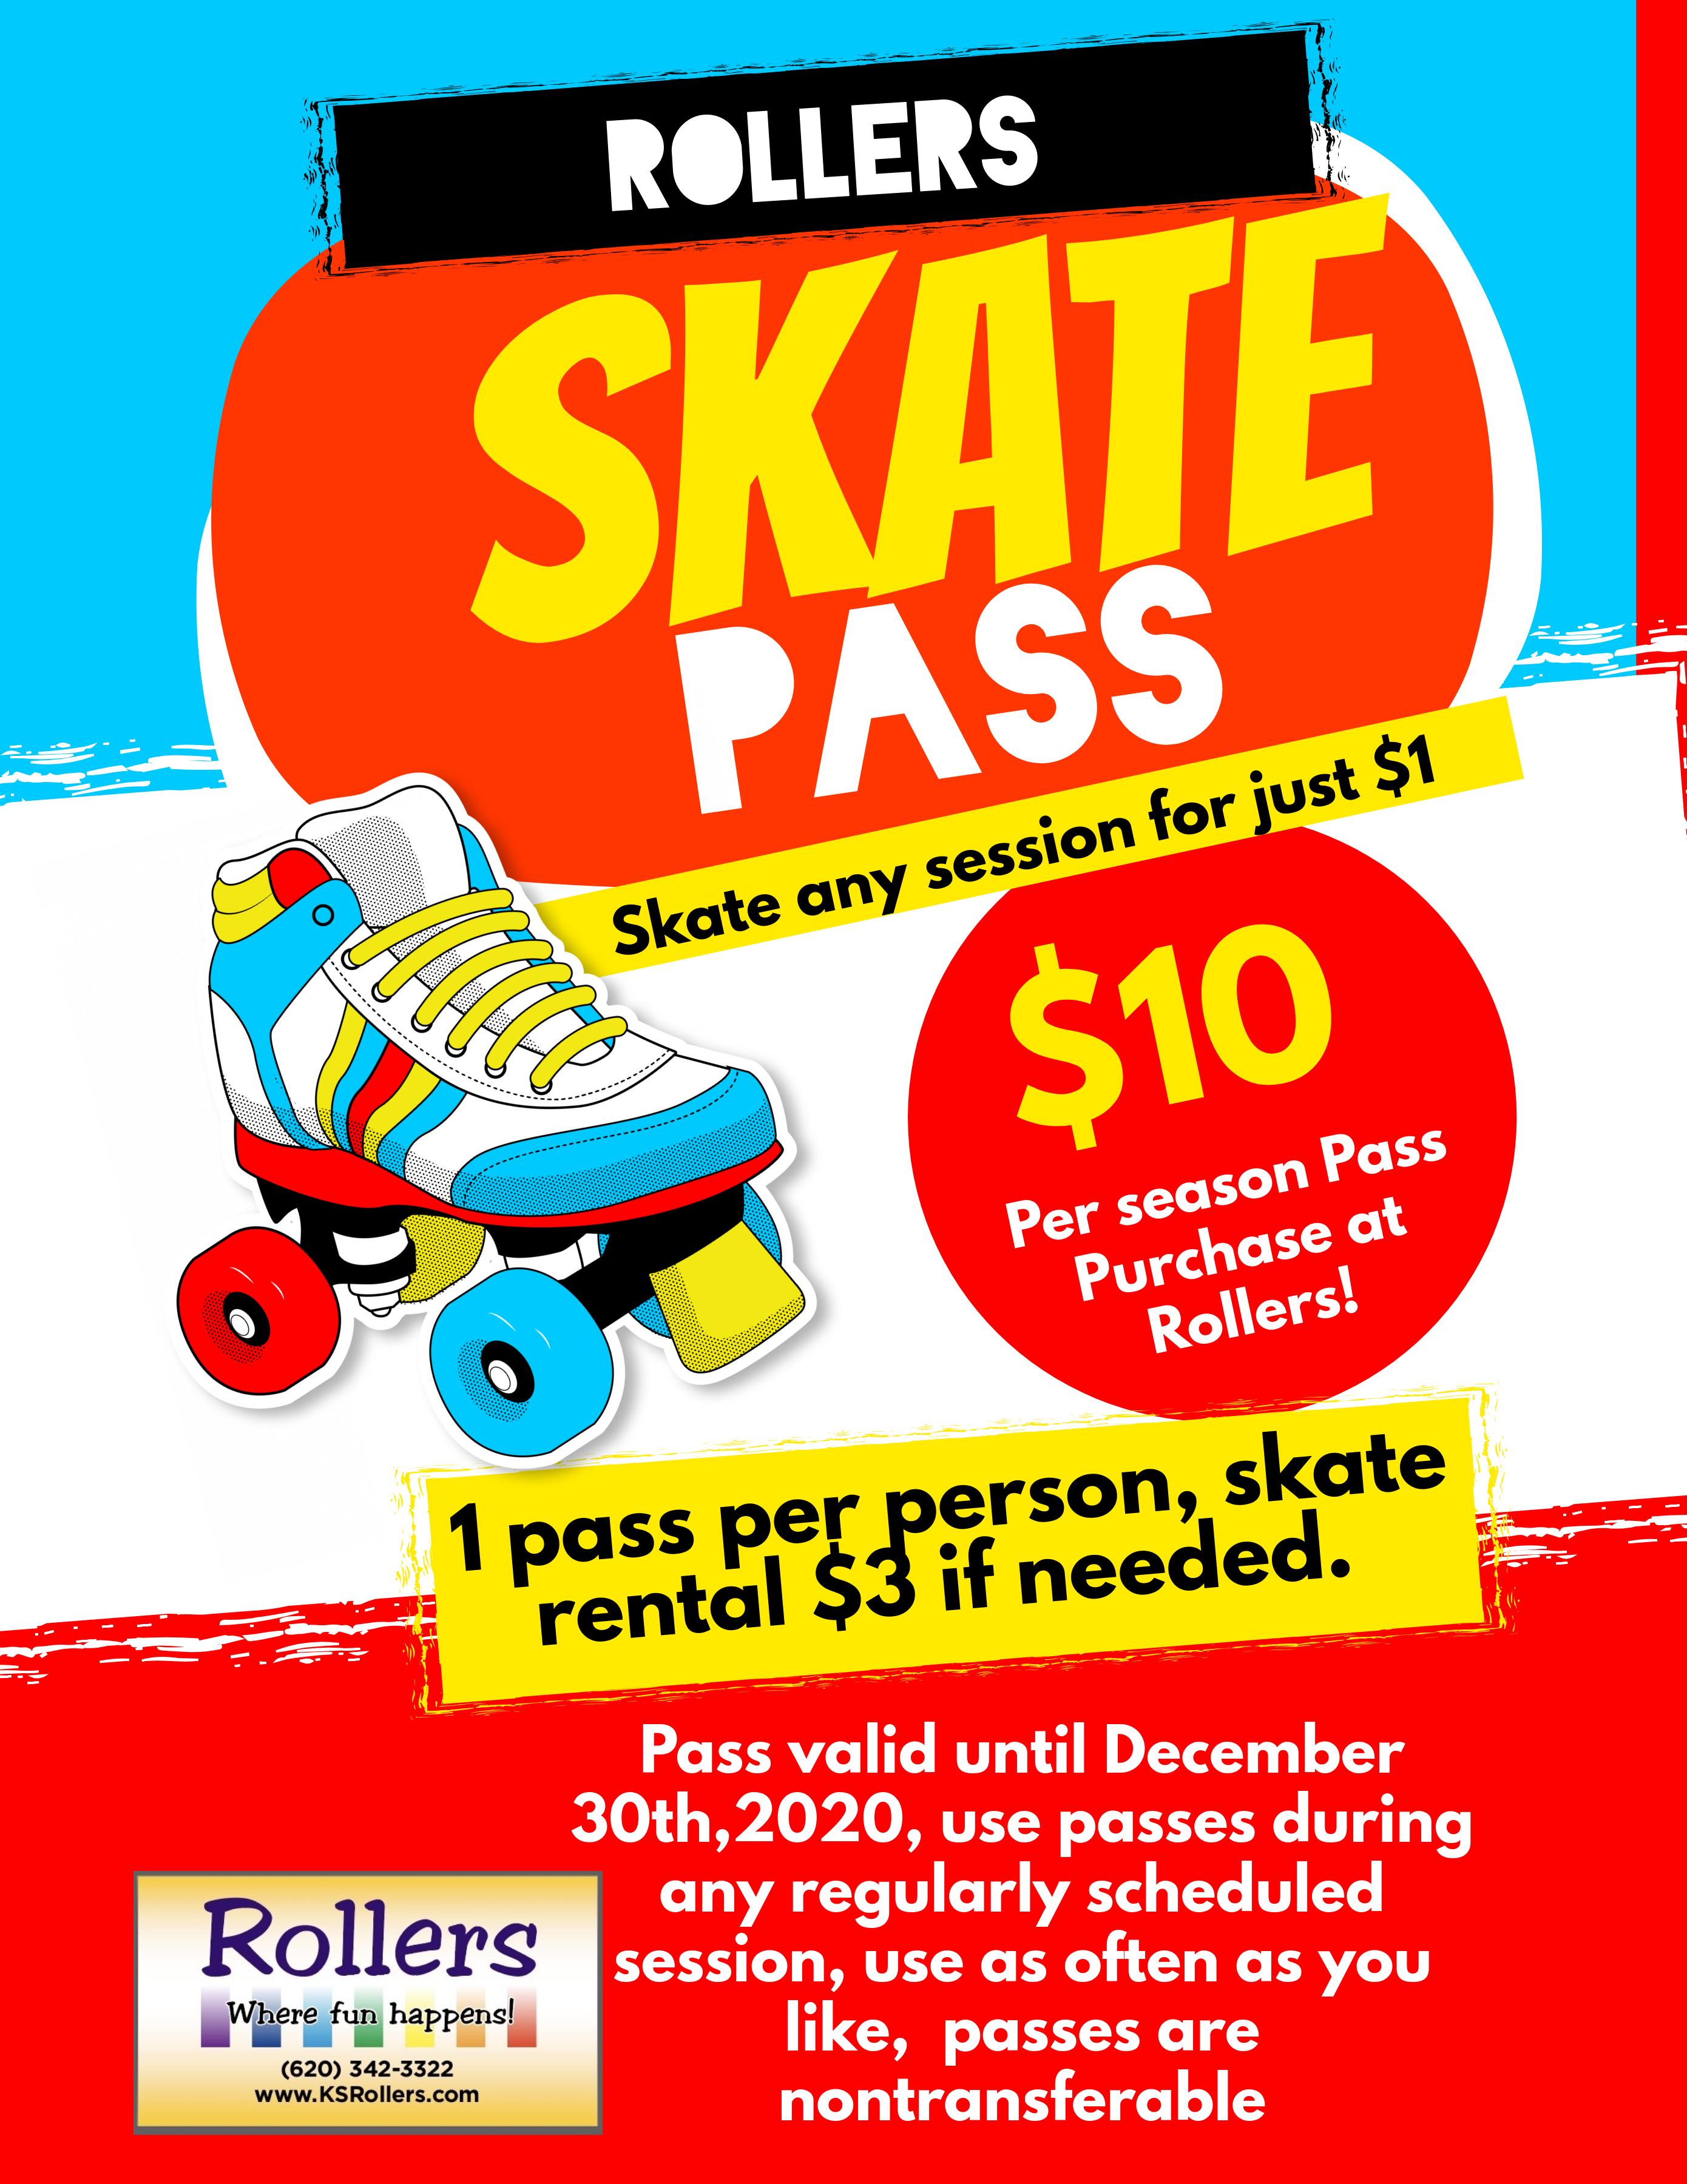 Copy of Skates Rental Service Poster Fly